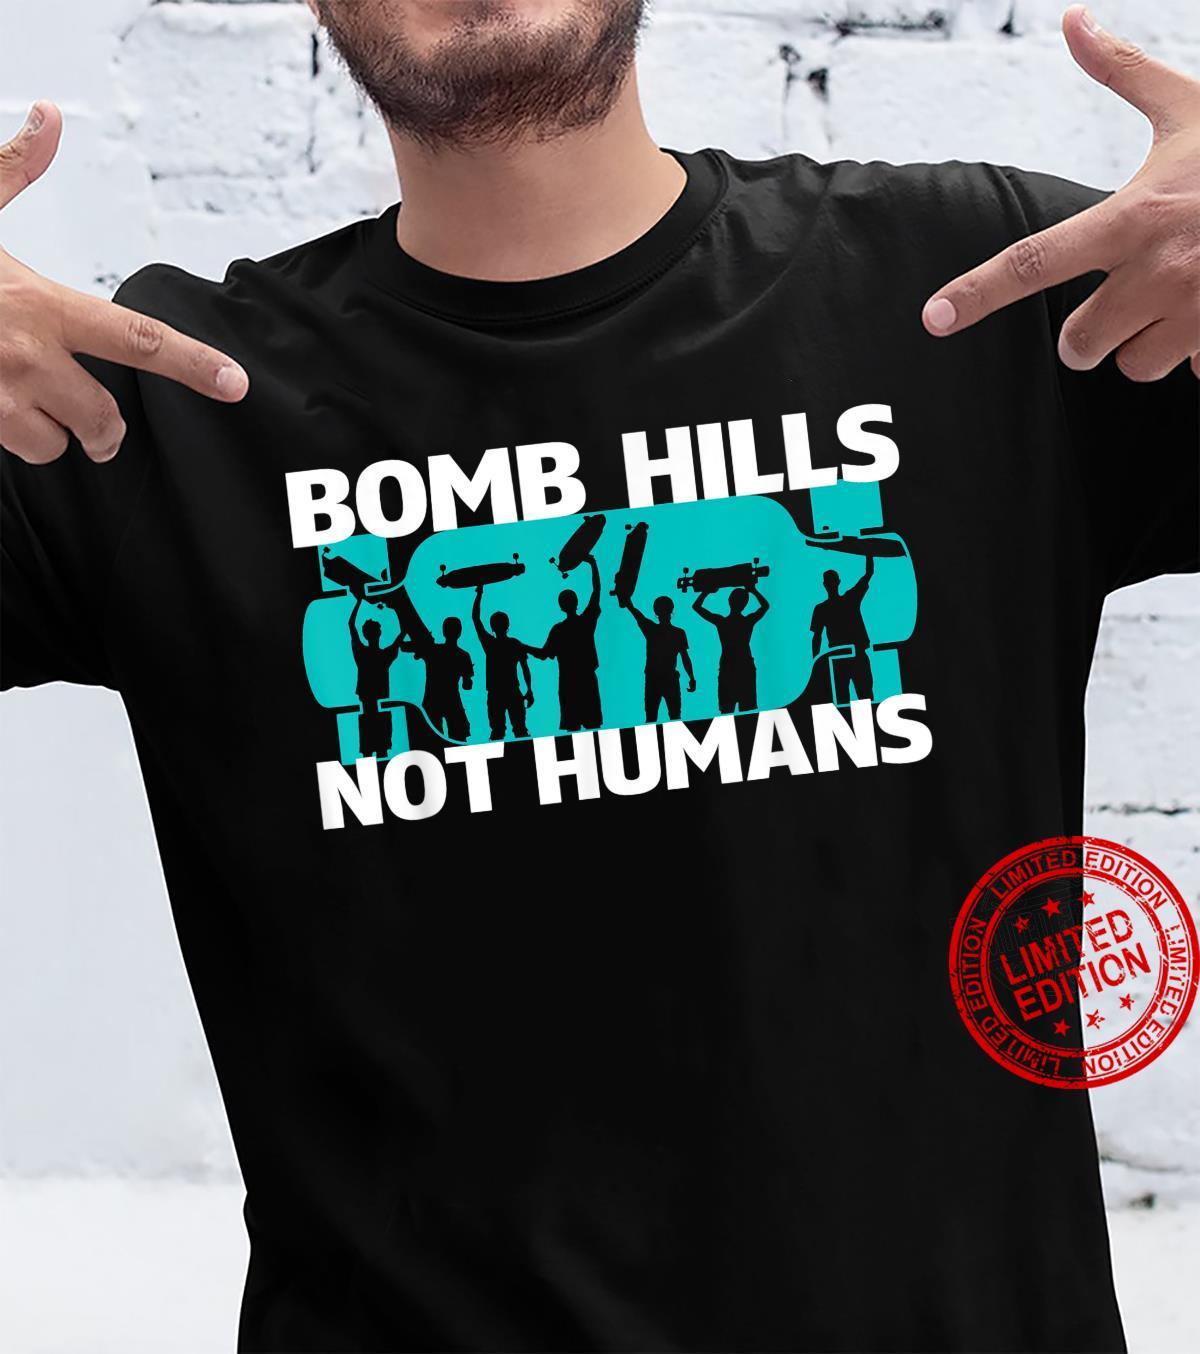 BOMB HILLS NOT HUMANS Longboarding Club Shirt